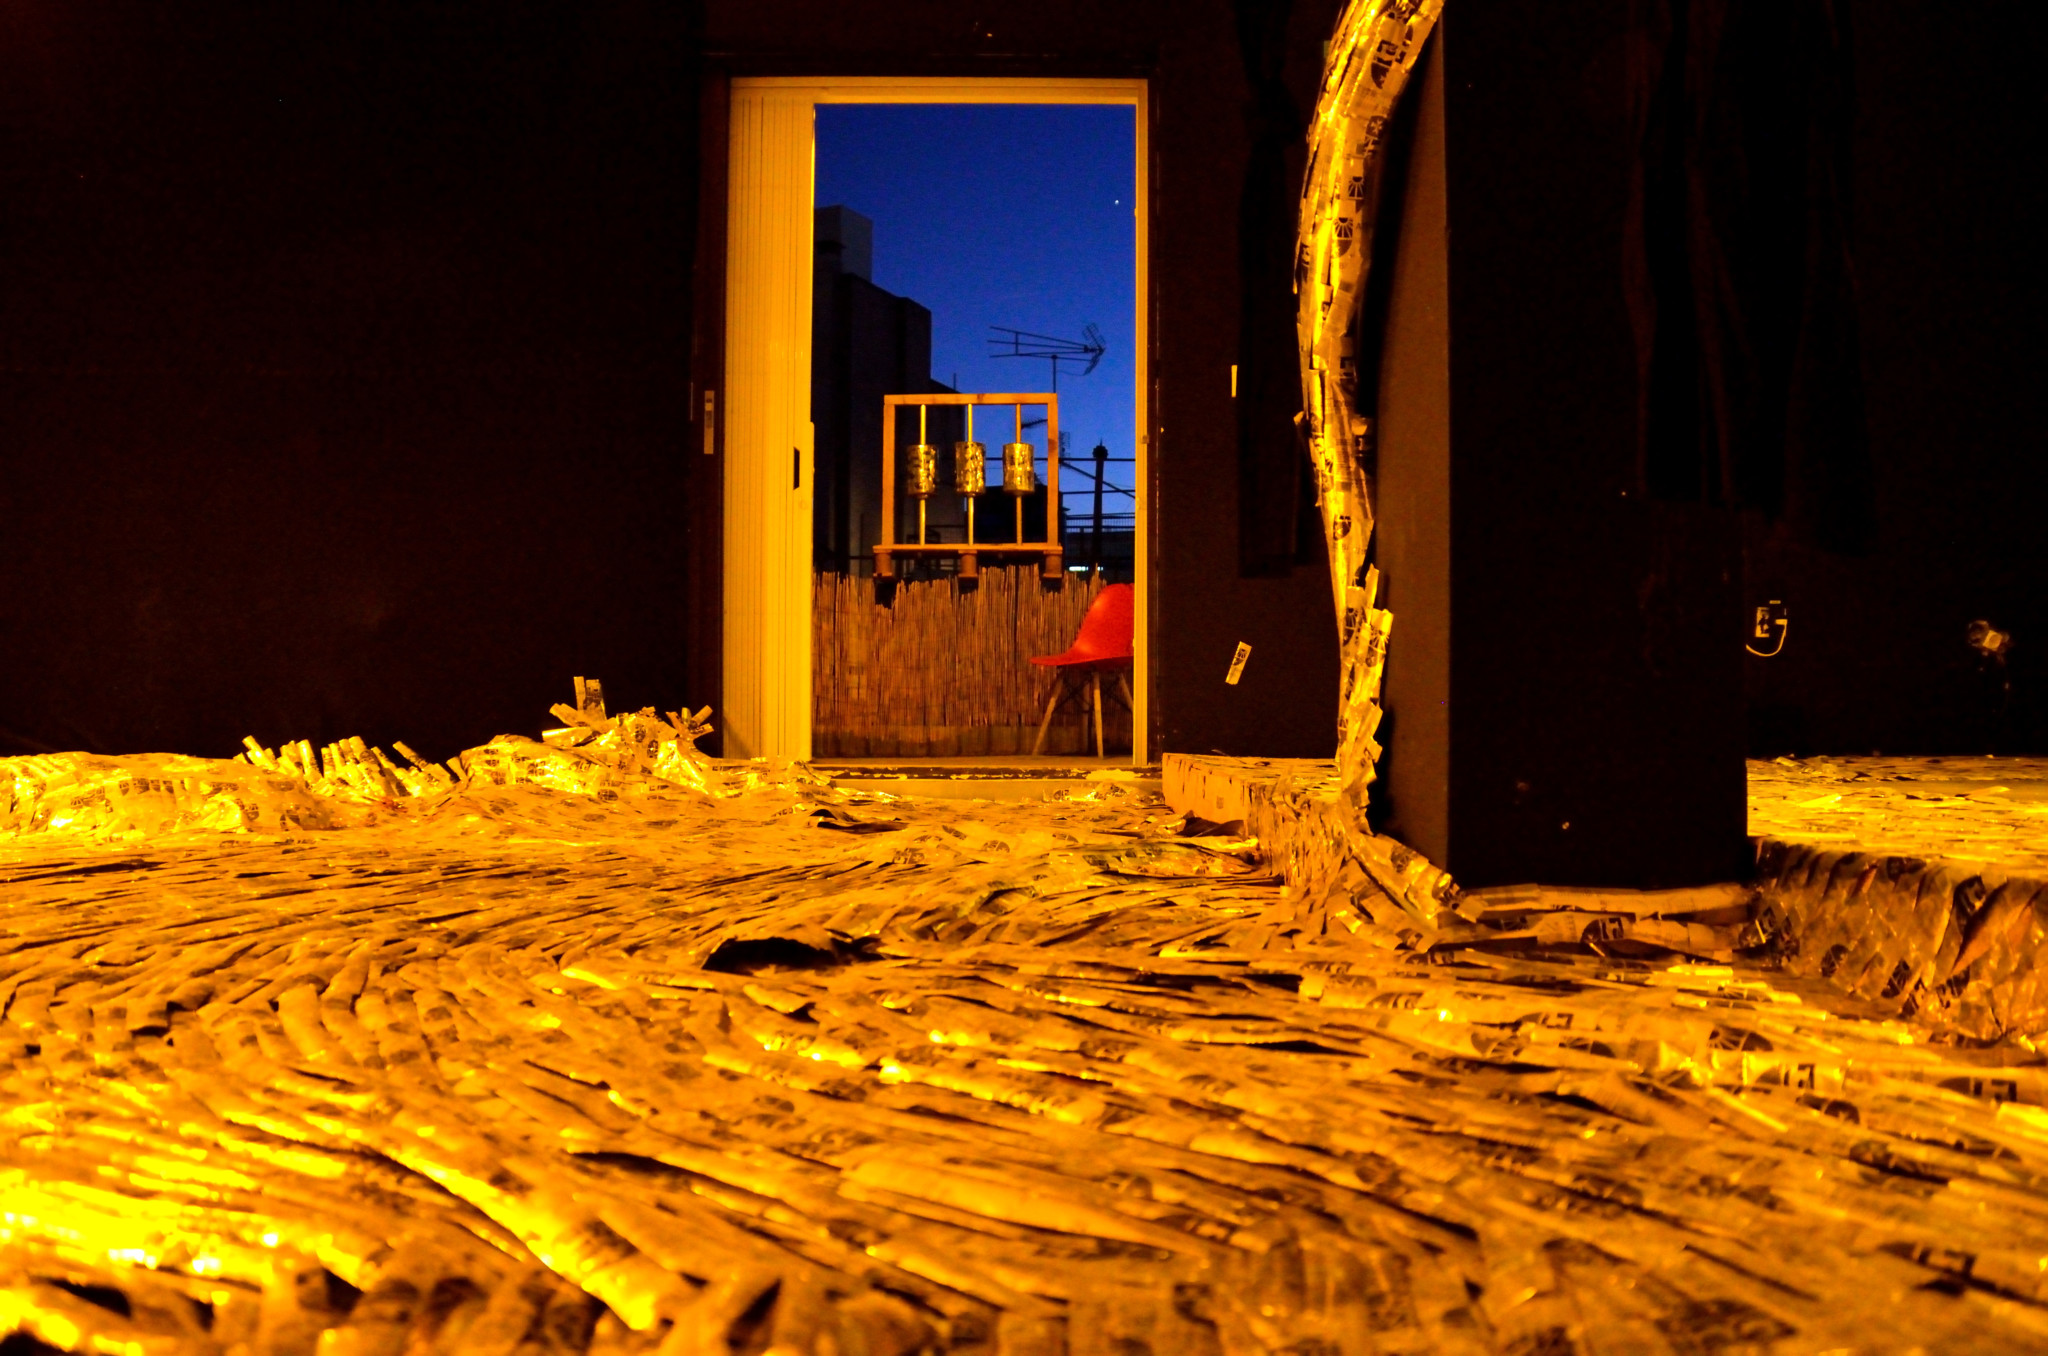 sound room, Trash Temple, 2019 by Vandaloop collective